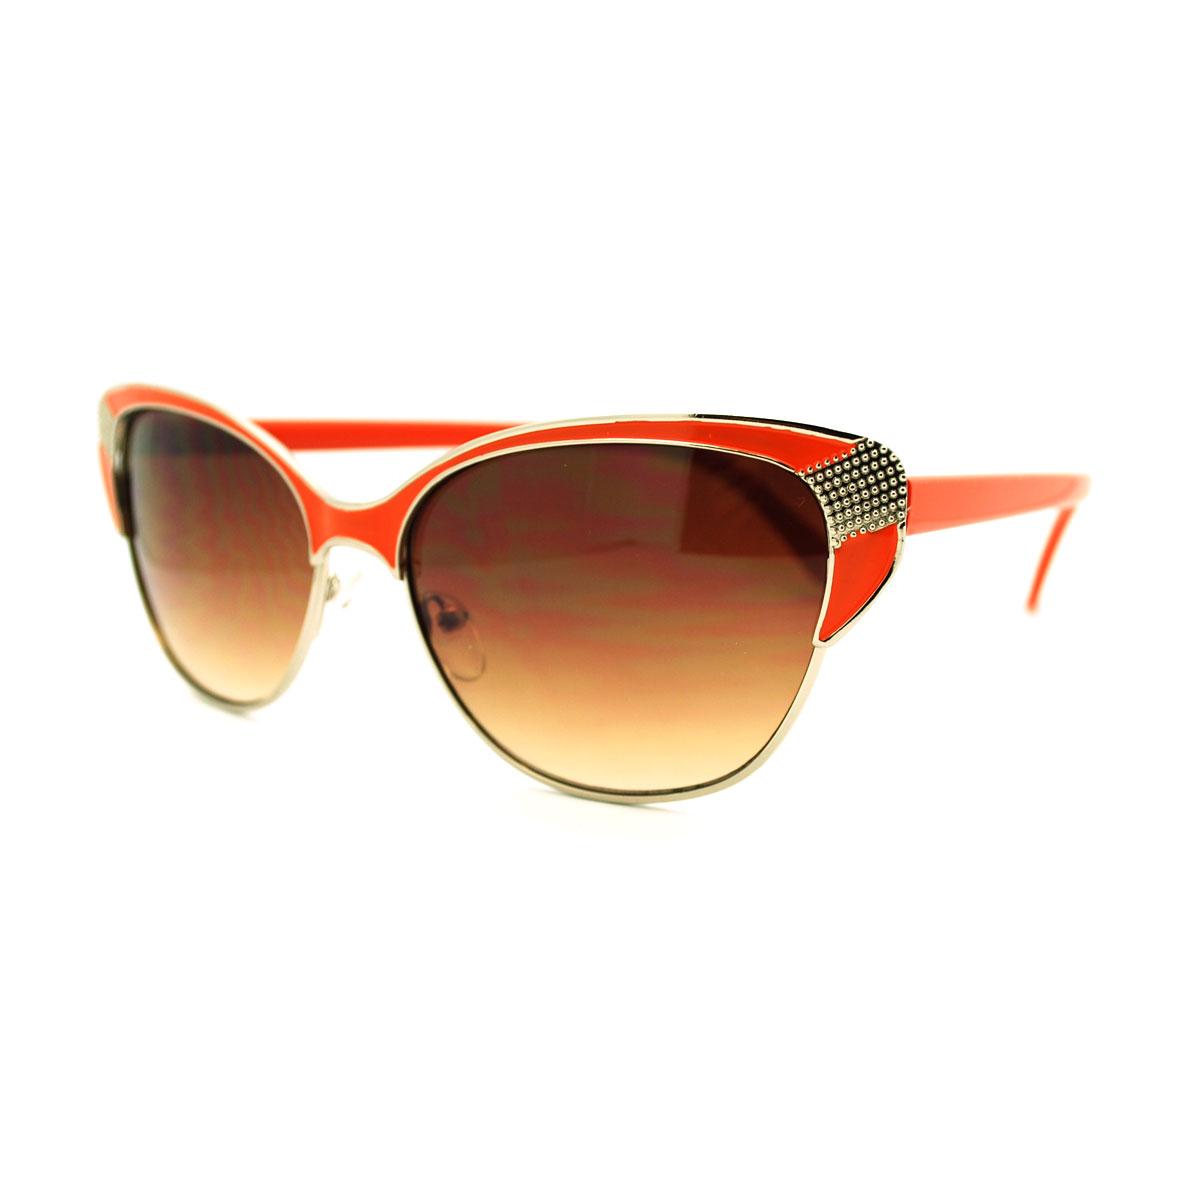 Zenni Optical Glasses Return : Adilibria Half Rim Sunglasses www.panaust.com.au